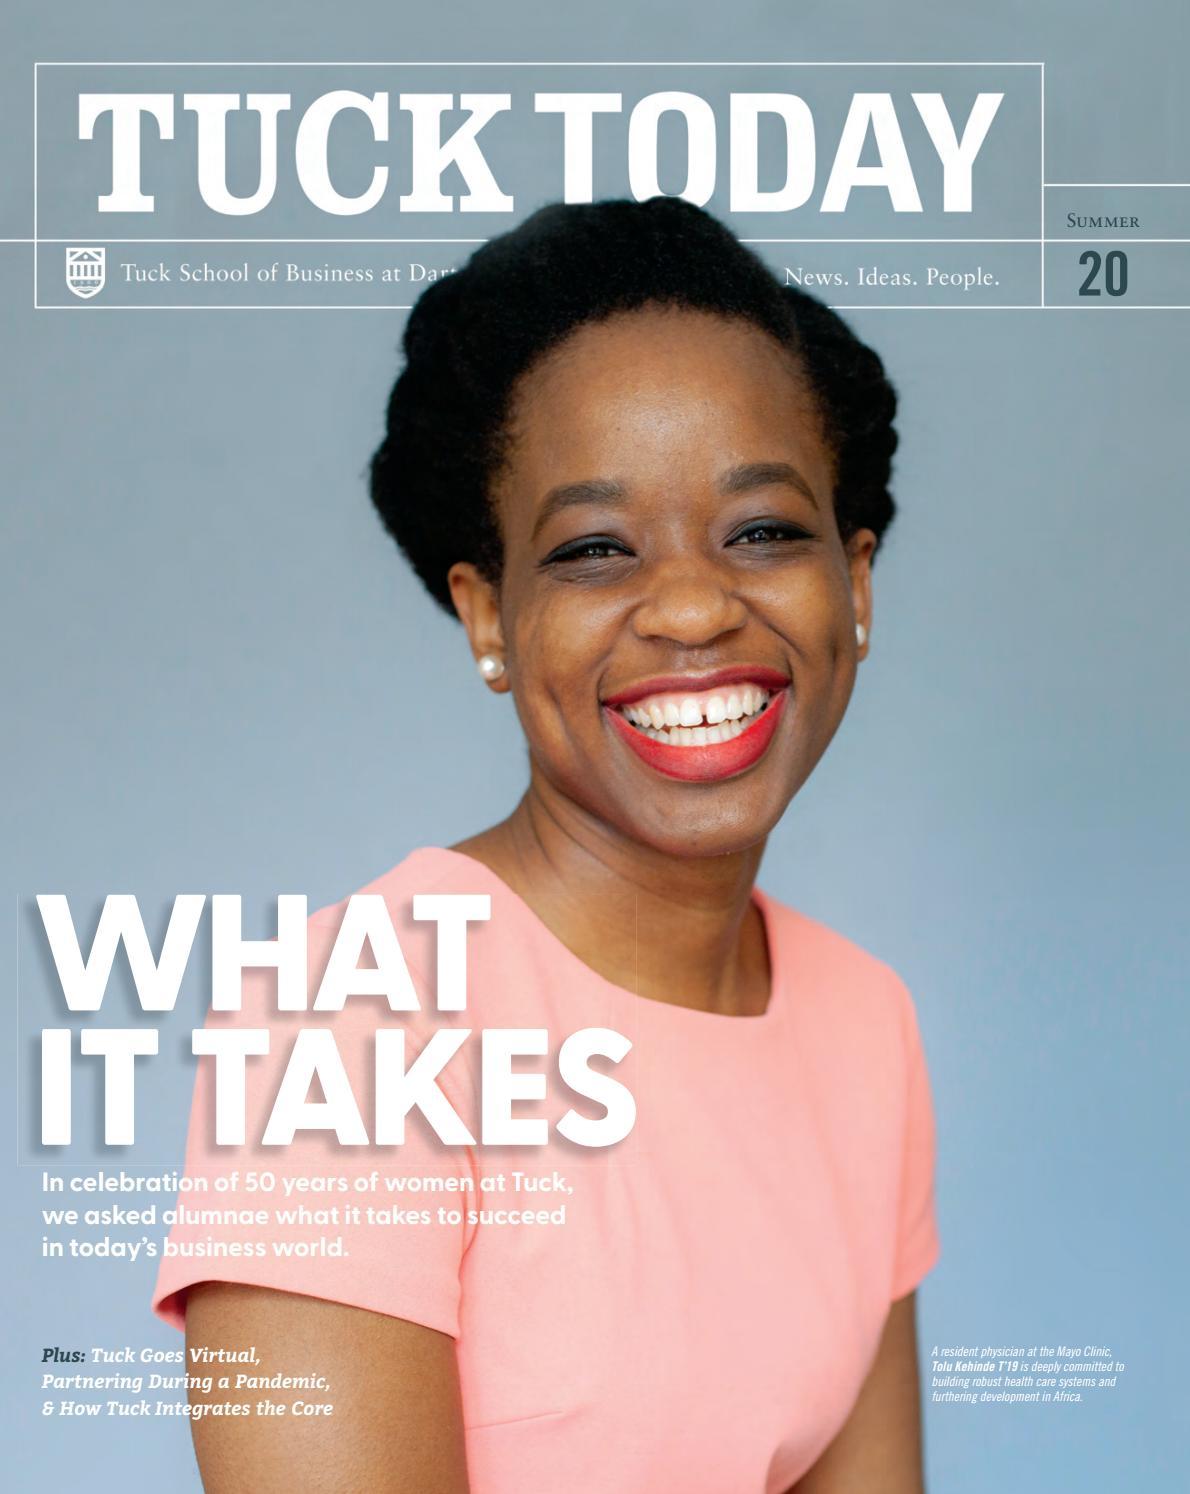 tuck today alumni magazine summer 2020tuck school of